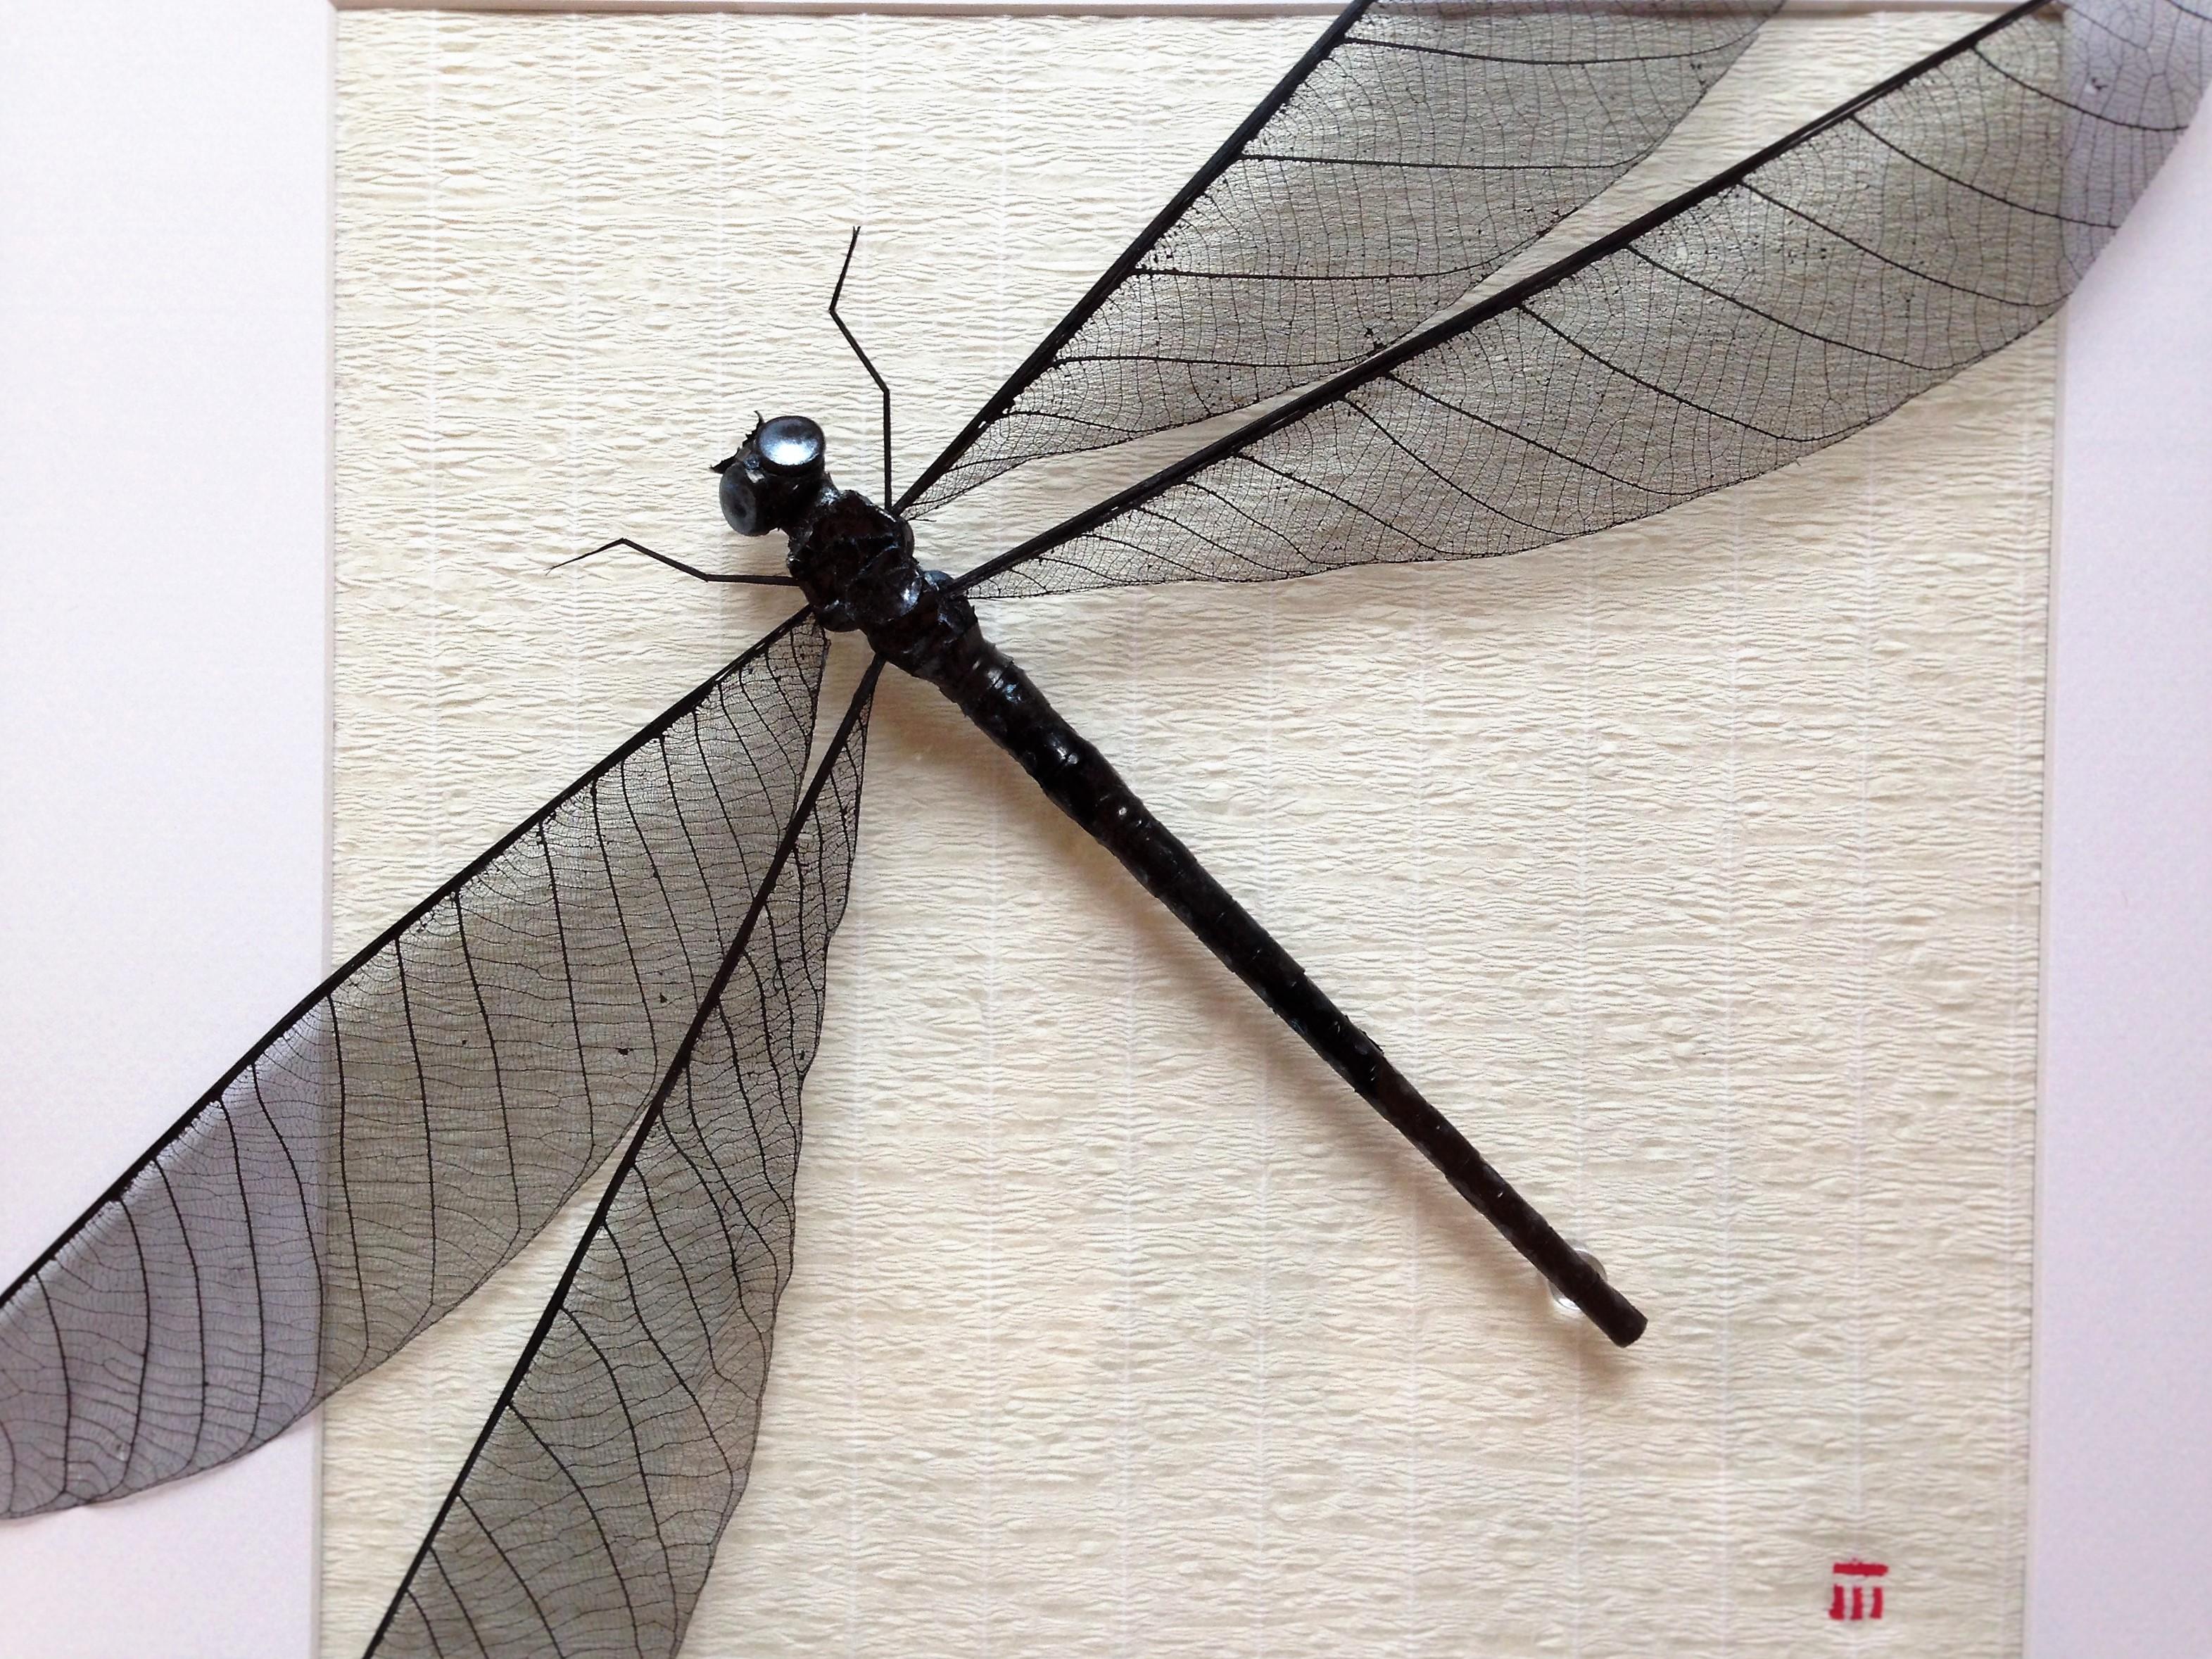 sumi-ink-black-dragonfly-artwork